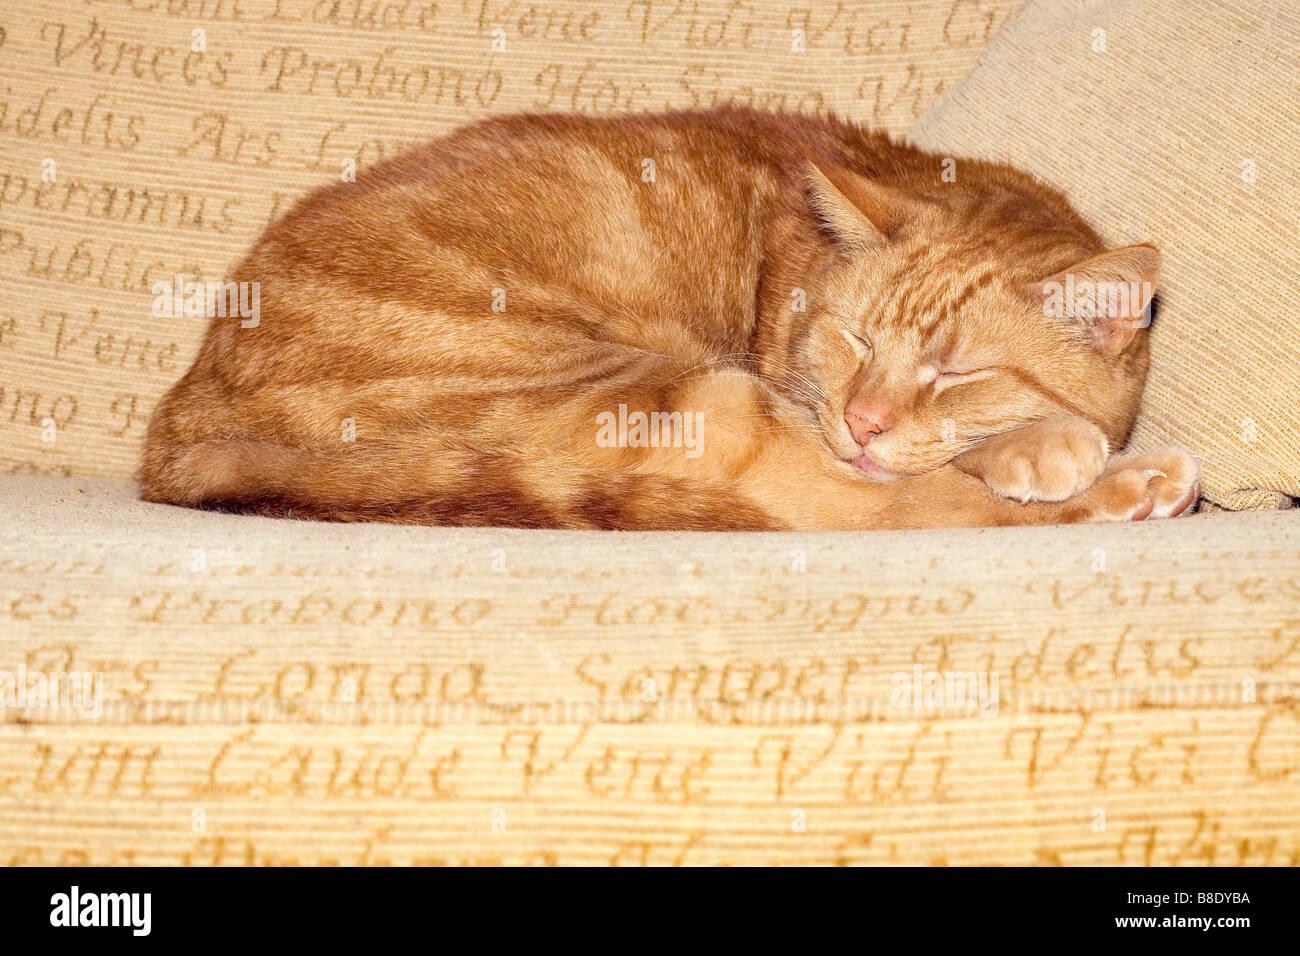 Cat asleep on sofa - Stock Image